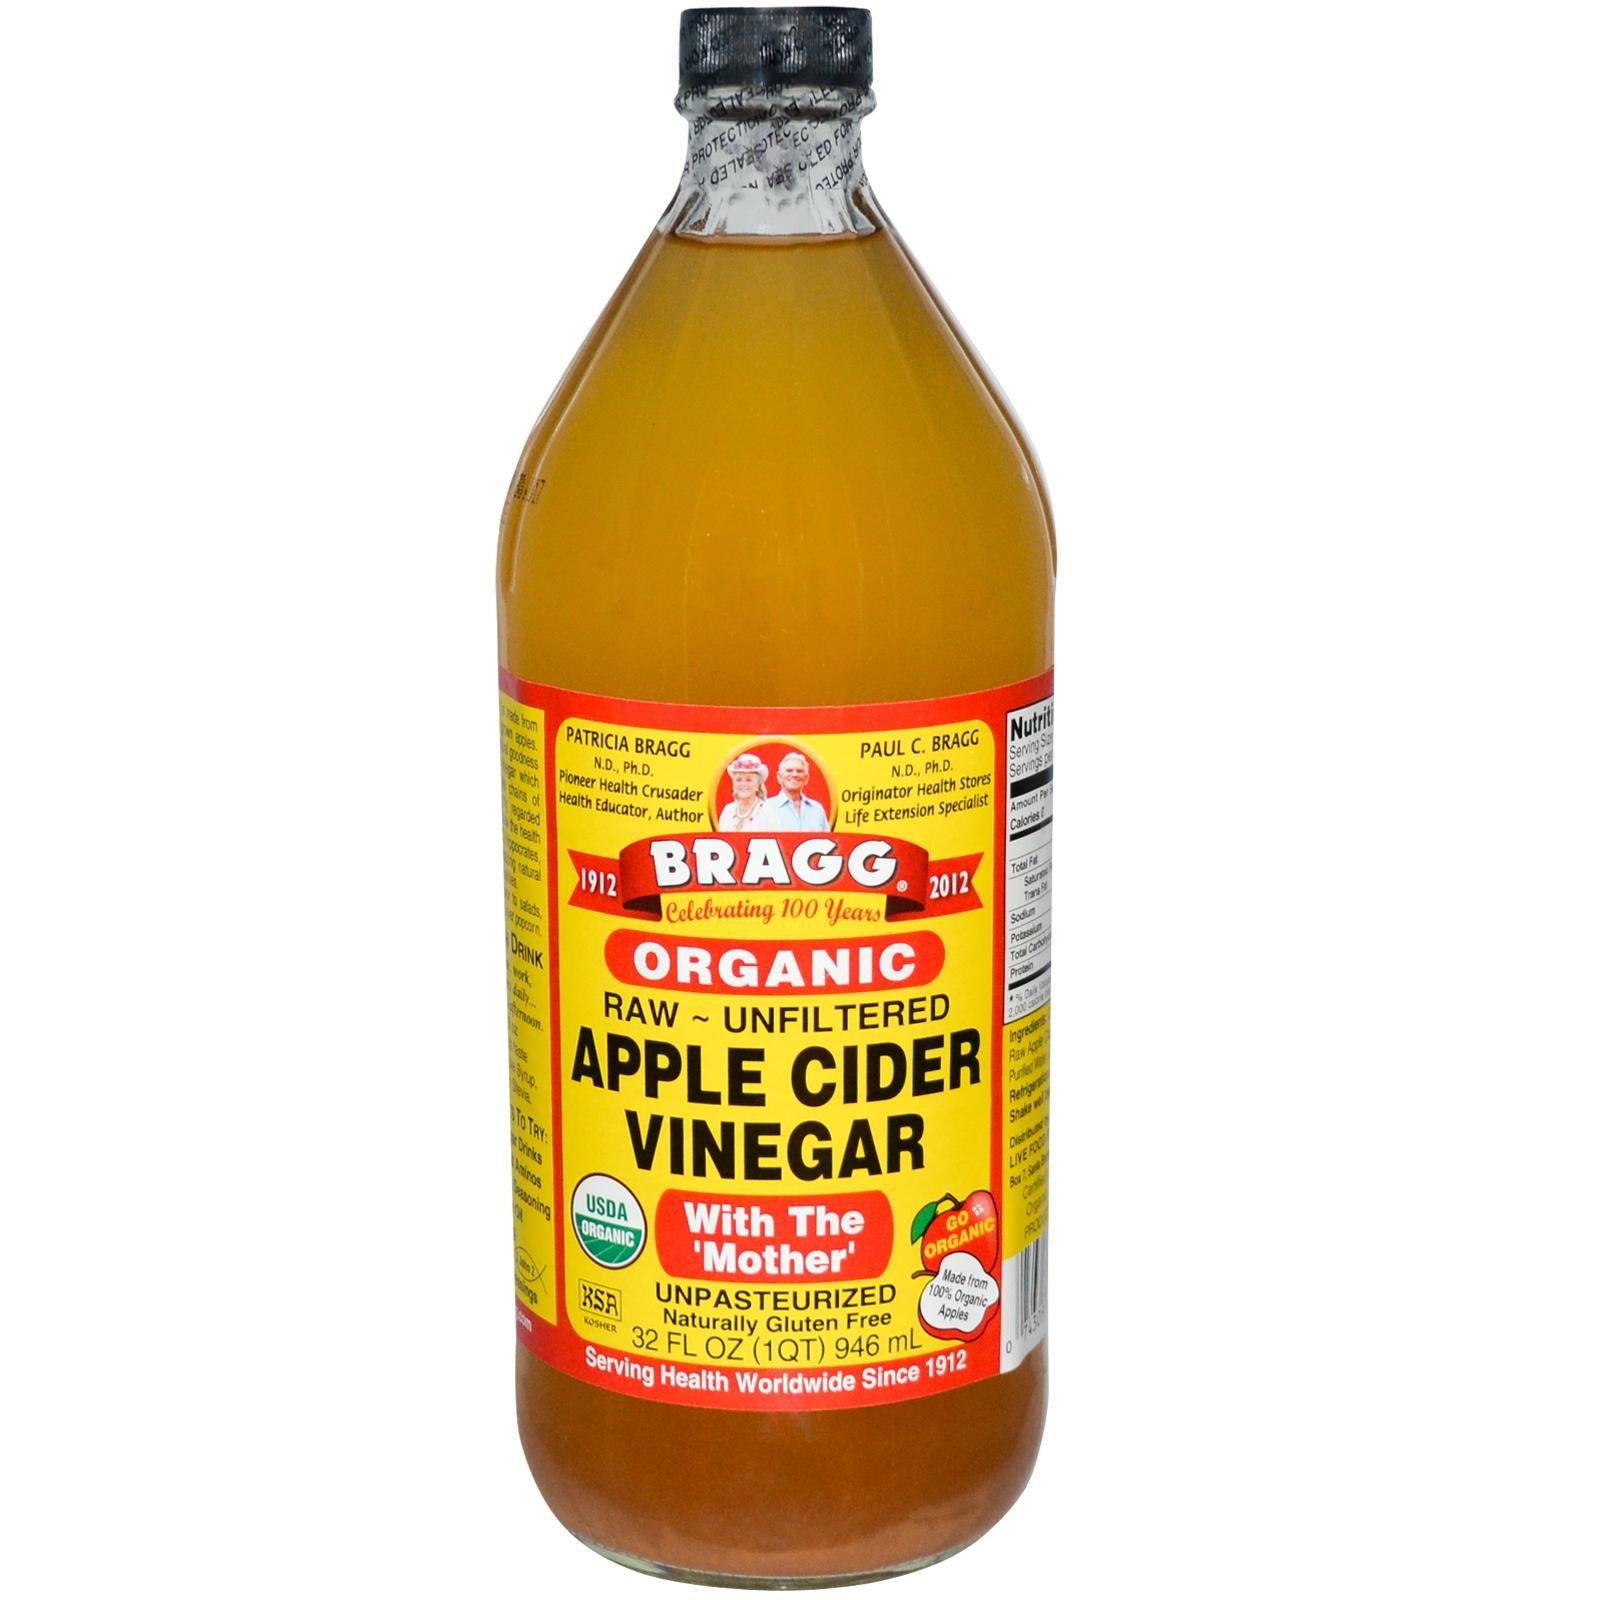 Bragg Organic Raw Apple Cider Vinegar, 32 Ounce - 12 Pack by Bragg